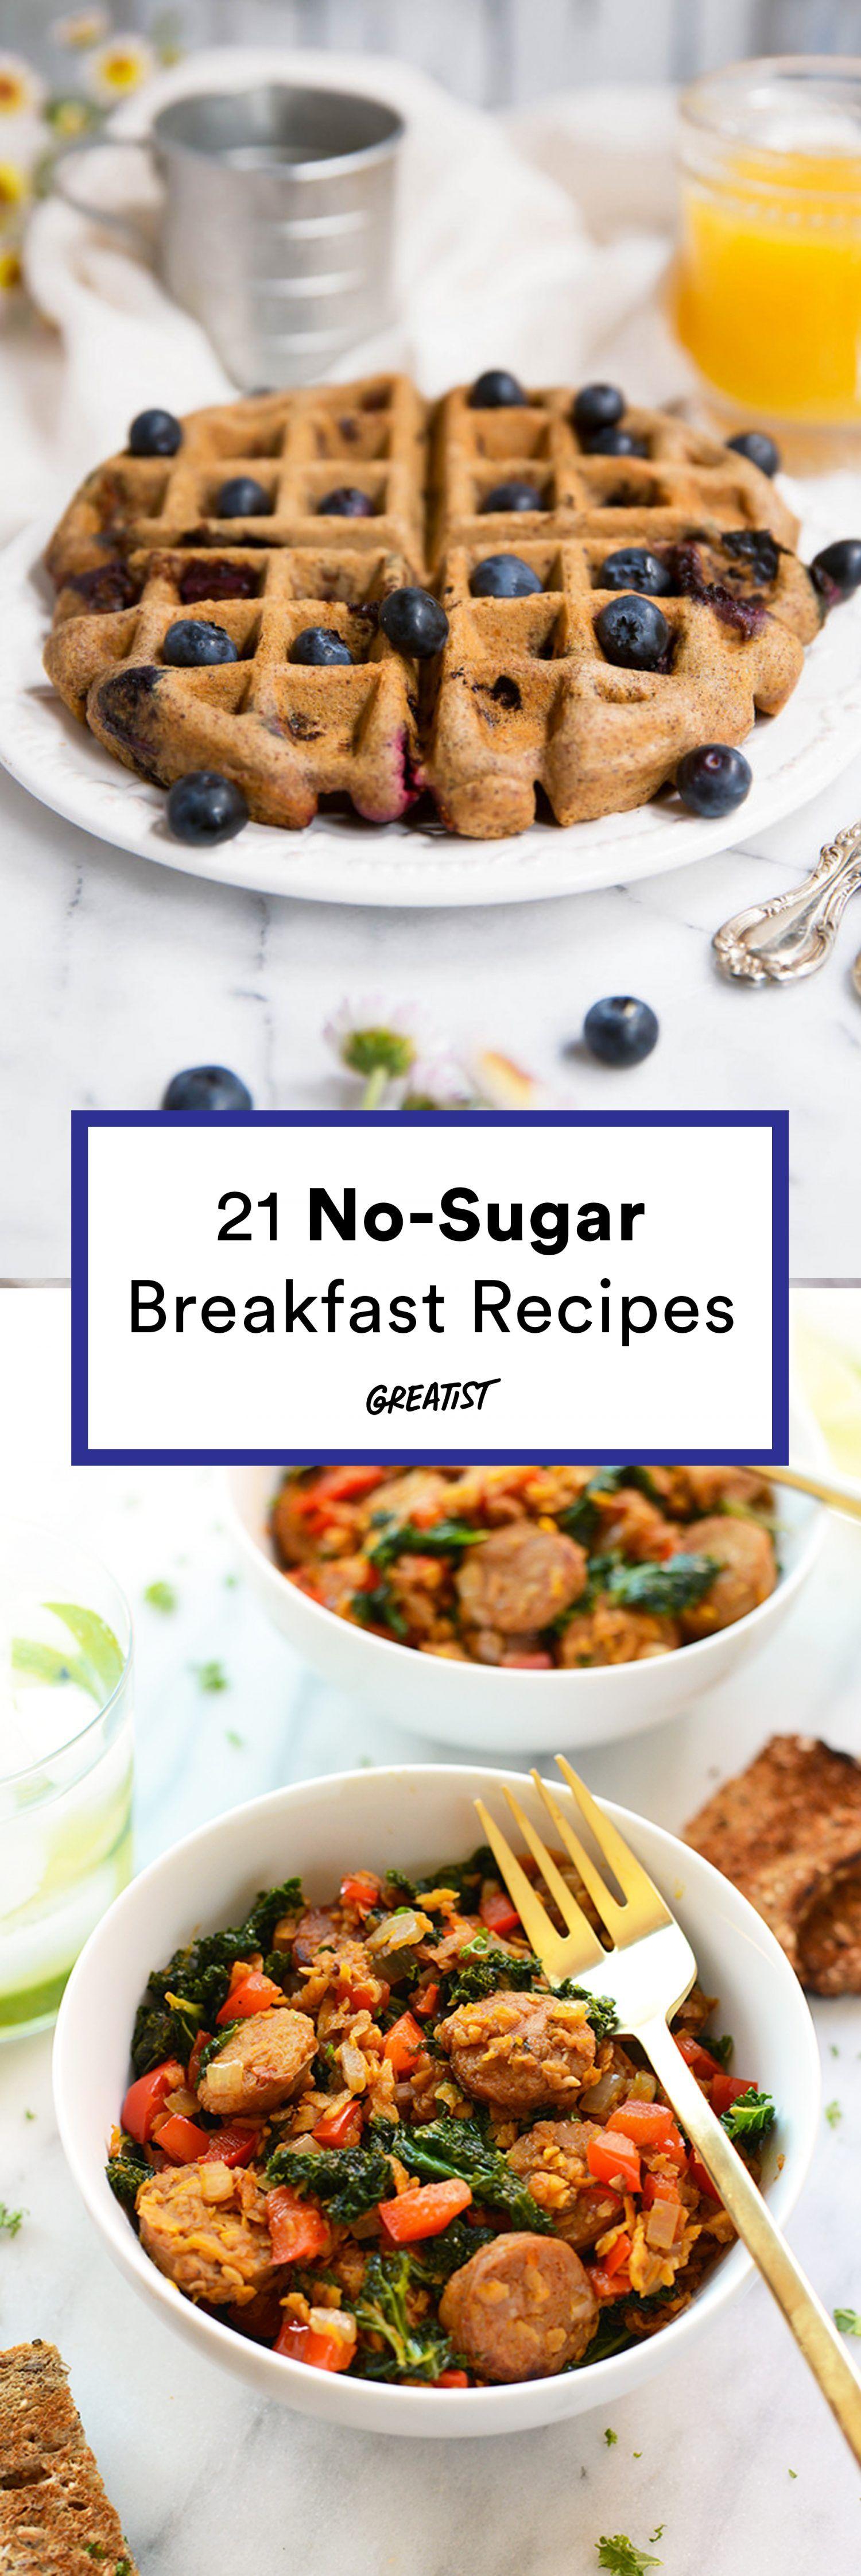 21 No Sugar Breakfast Recipes To Avoid An Early Crash Breakfast